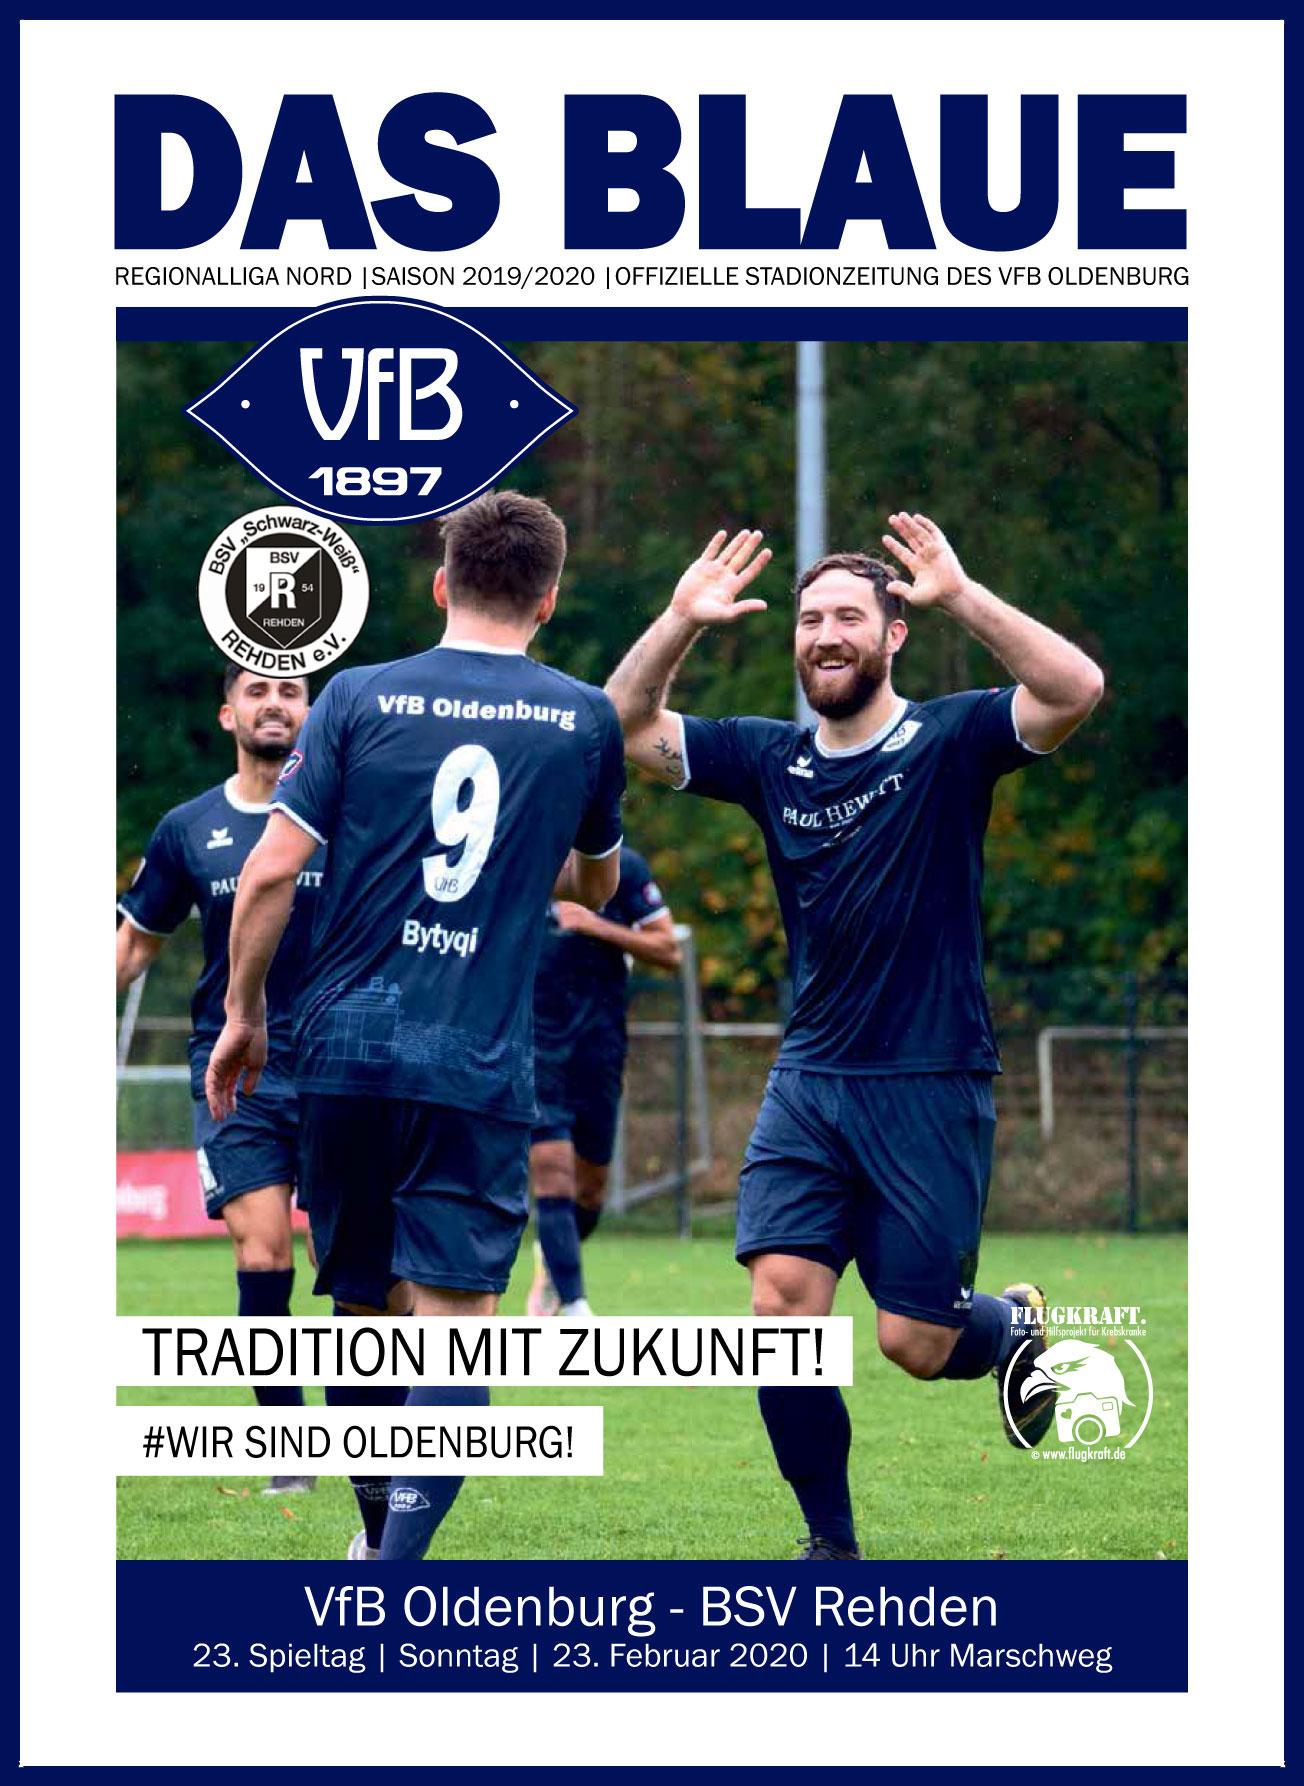 https://vfb-oldenburg.de/wp-content/uploads/VFB_Oldenburg_23_Spieltag_2019_2020-1.jpg